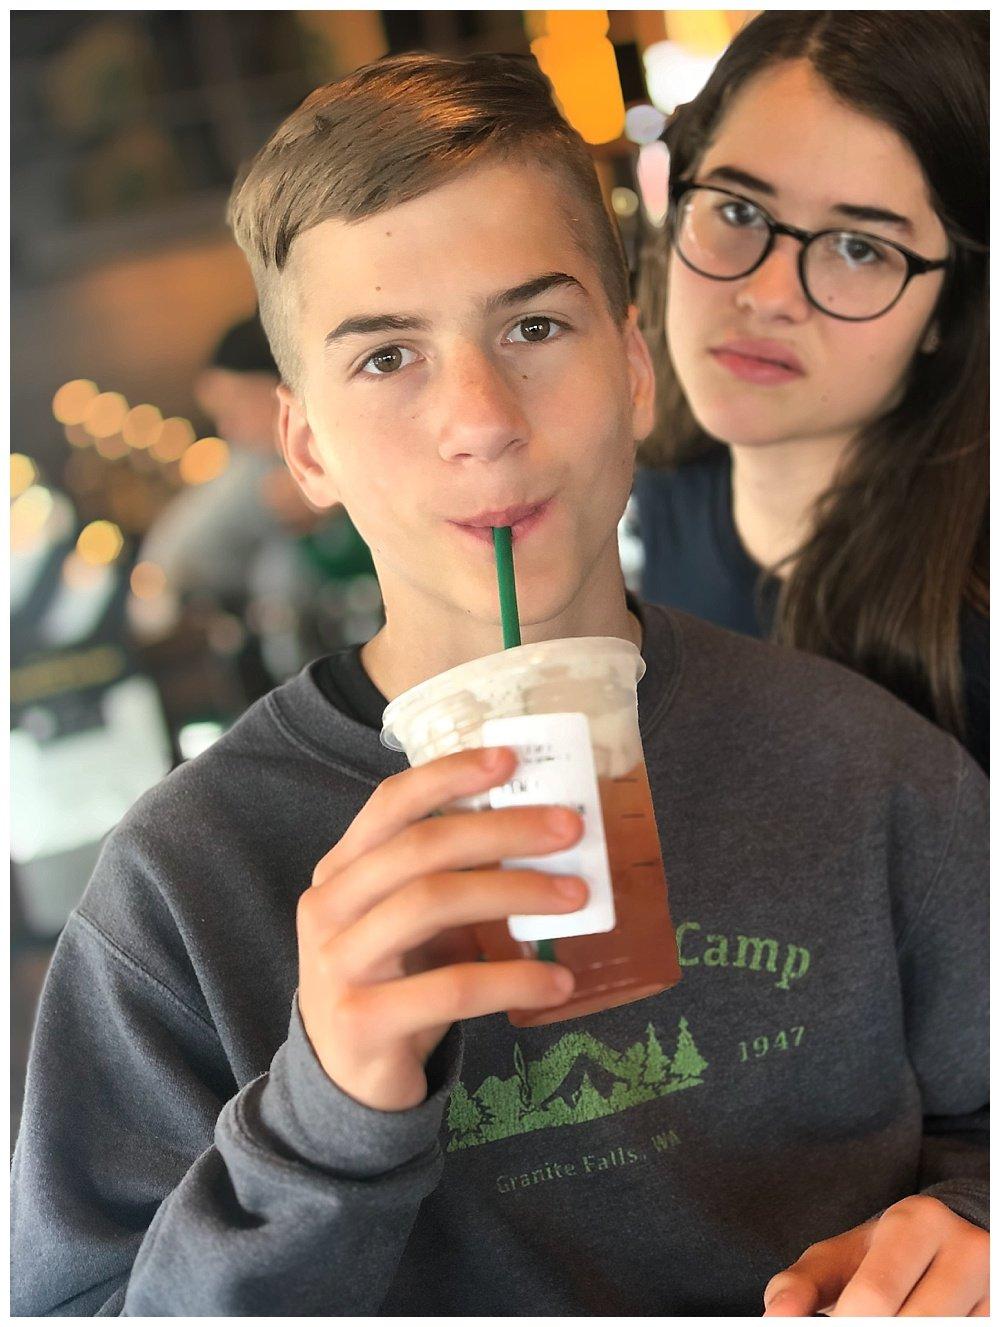 Hezekiah and Jubilee in Starbucks.